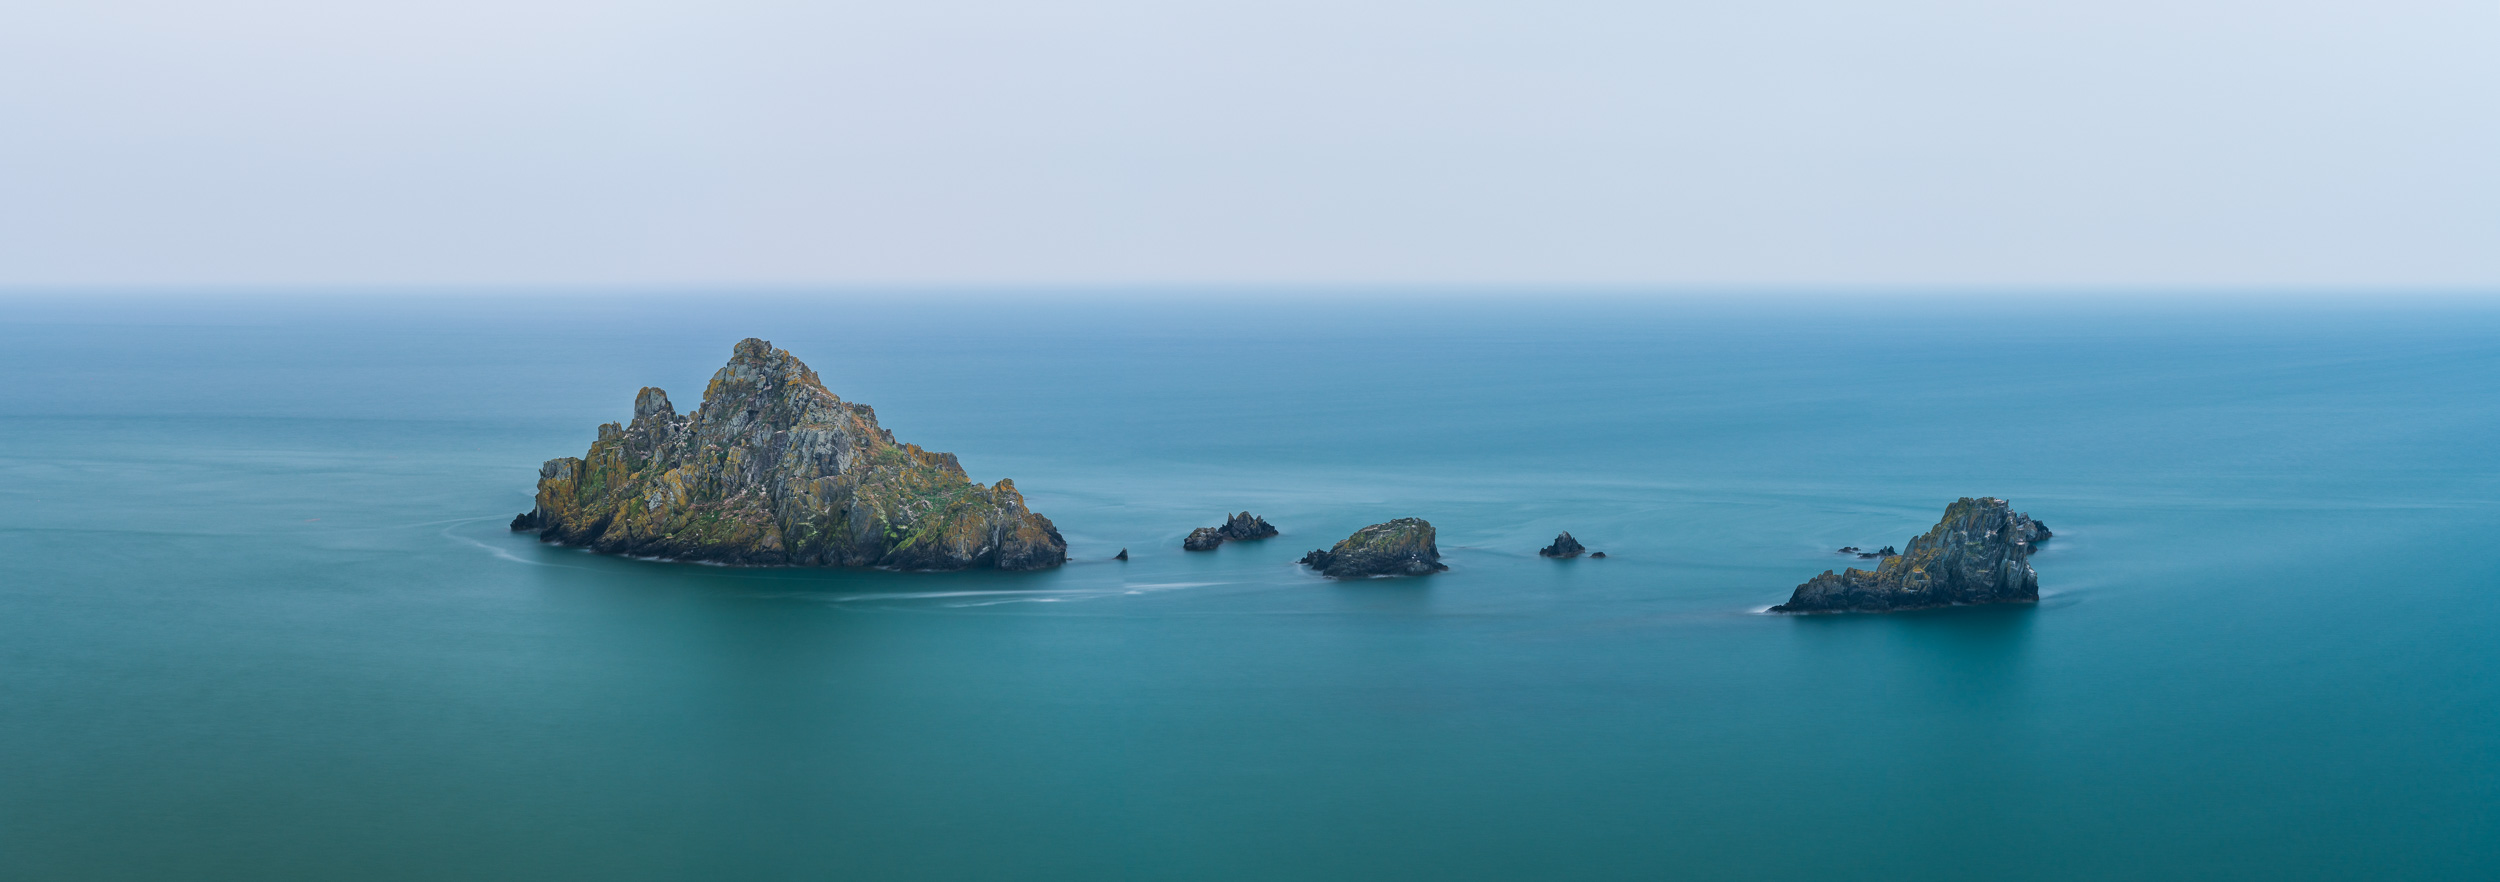 On an Island  - Froward Point, Devon: Nikon D850, Nikkor 24-70 mm f/2.8 at 58 mm, 105 secs at f/6.3, ISO 64, Lee Filters Circular Polariser. 5 Image stitch.